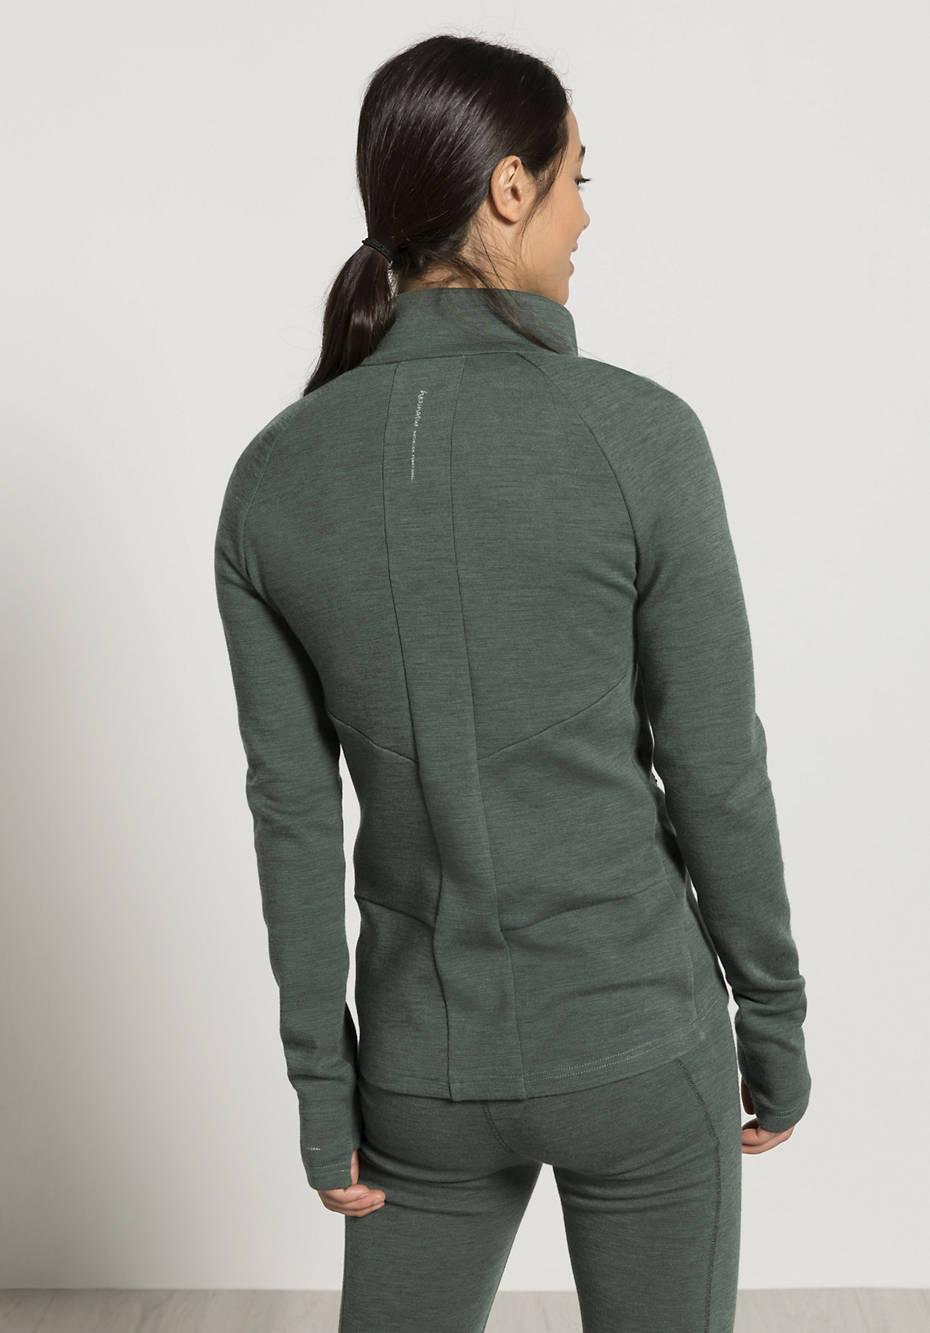 Quilted jacket made of organic merino wool, kapok and organic cotton